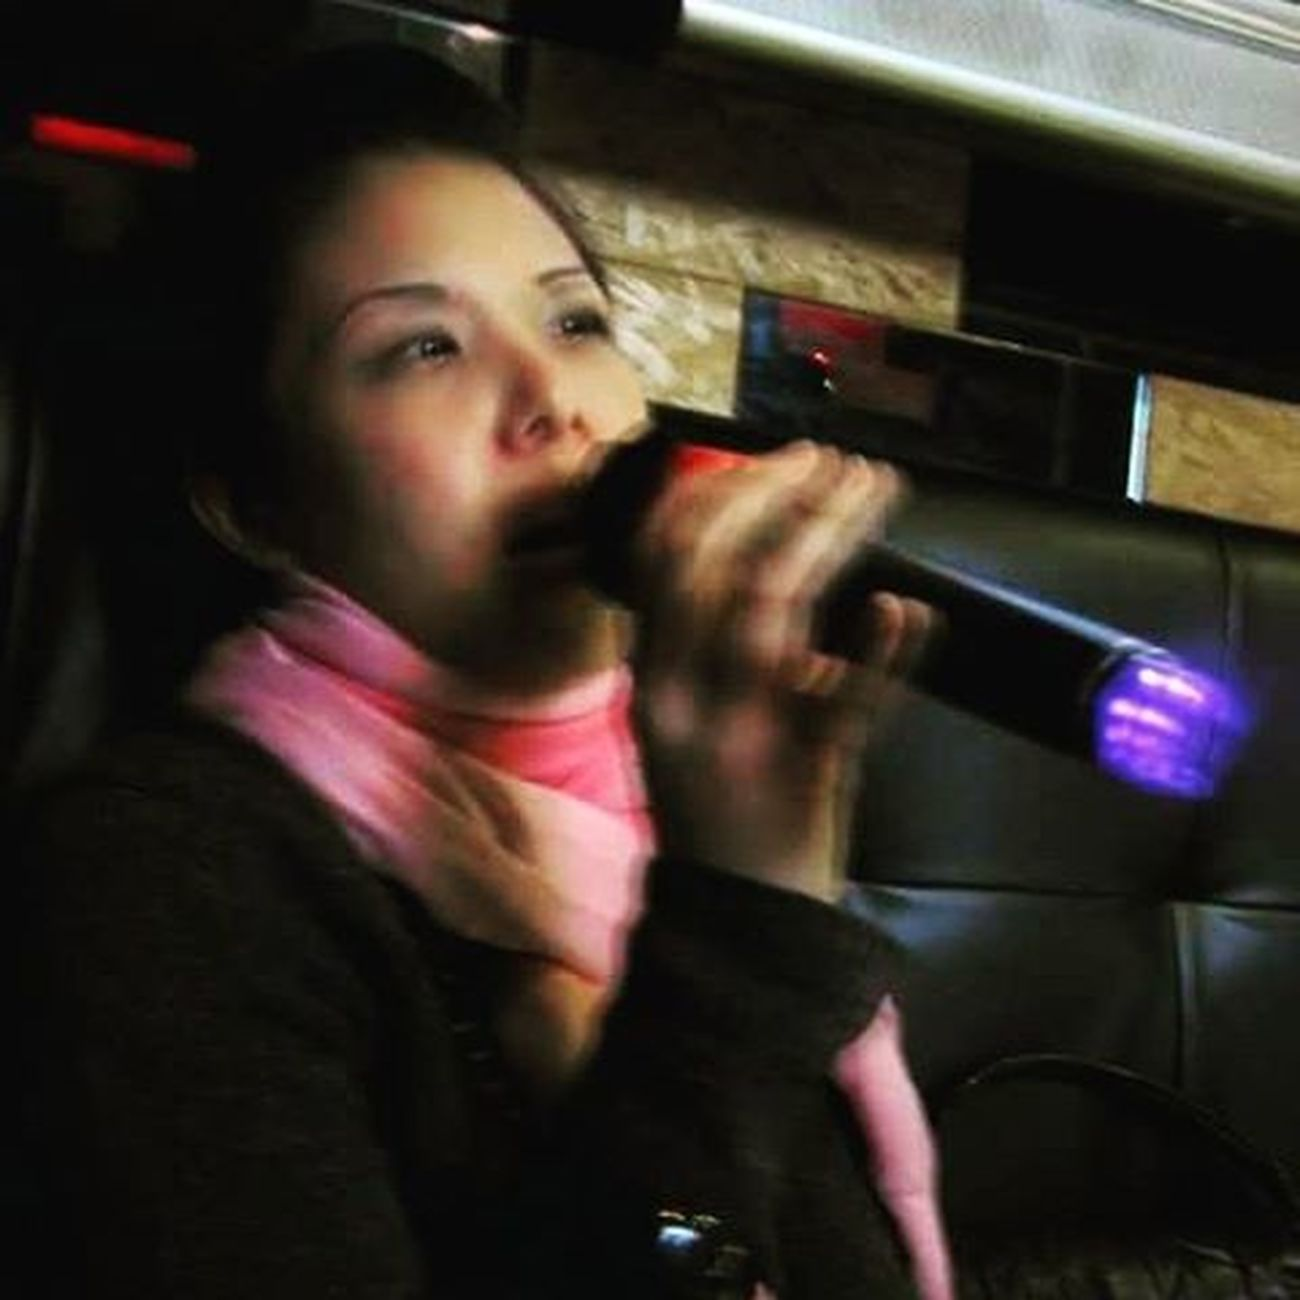 OnThisDay six years ago tonight Singing Karaoke to celebrate the birthday of @imadadadada 🎉🎤🎉 happy birthday again DaDa 🎁 🎂 😘 Neway Newaykaraoke HongKong